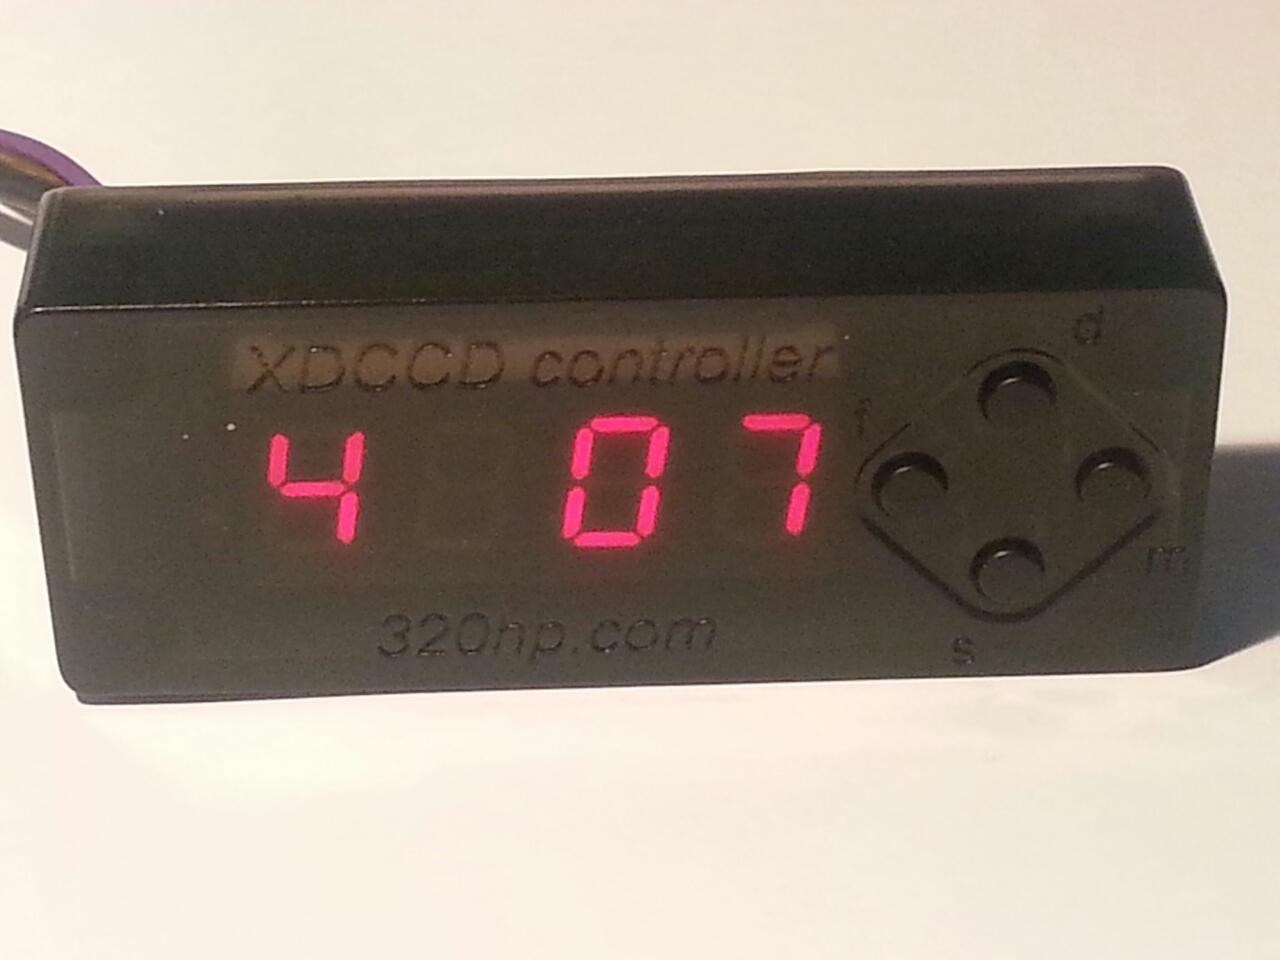 ПО DCCD Subaru controller software